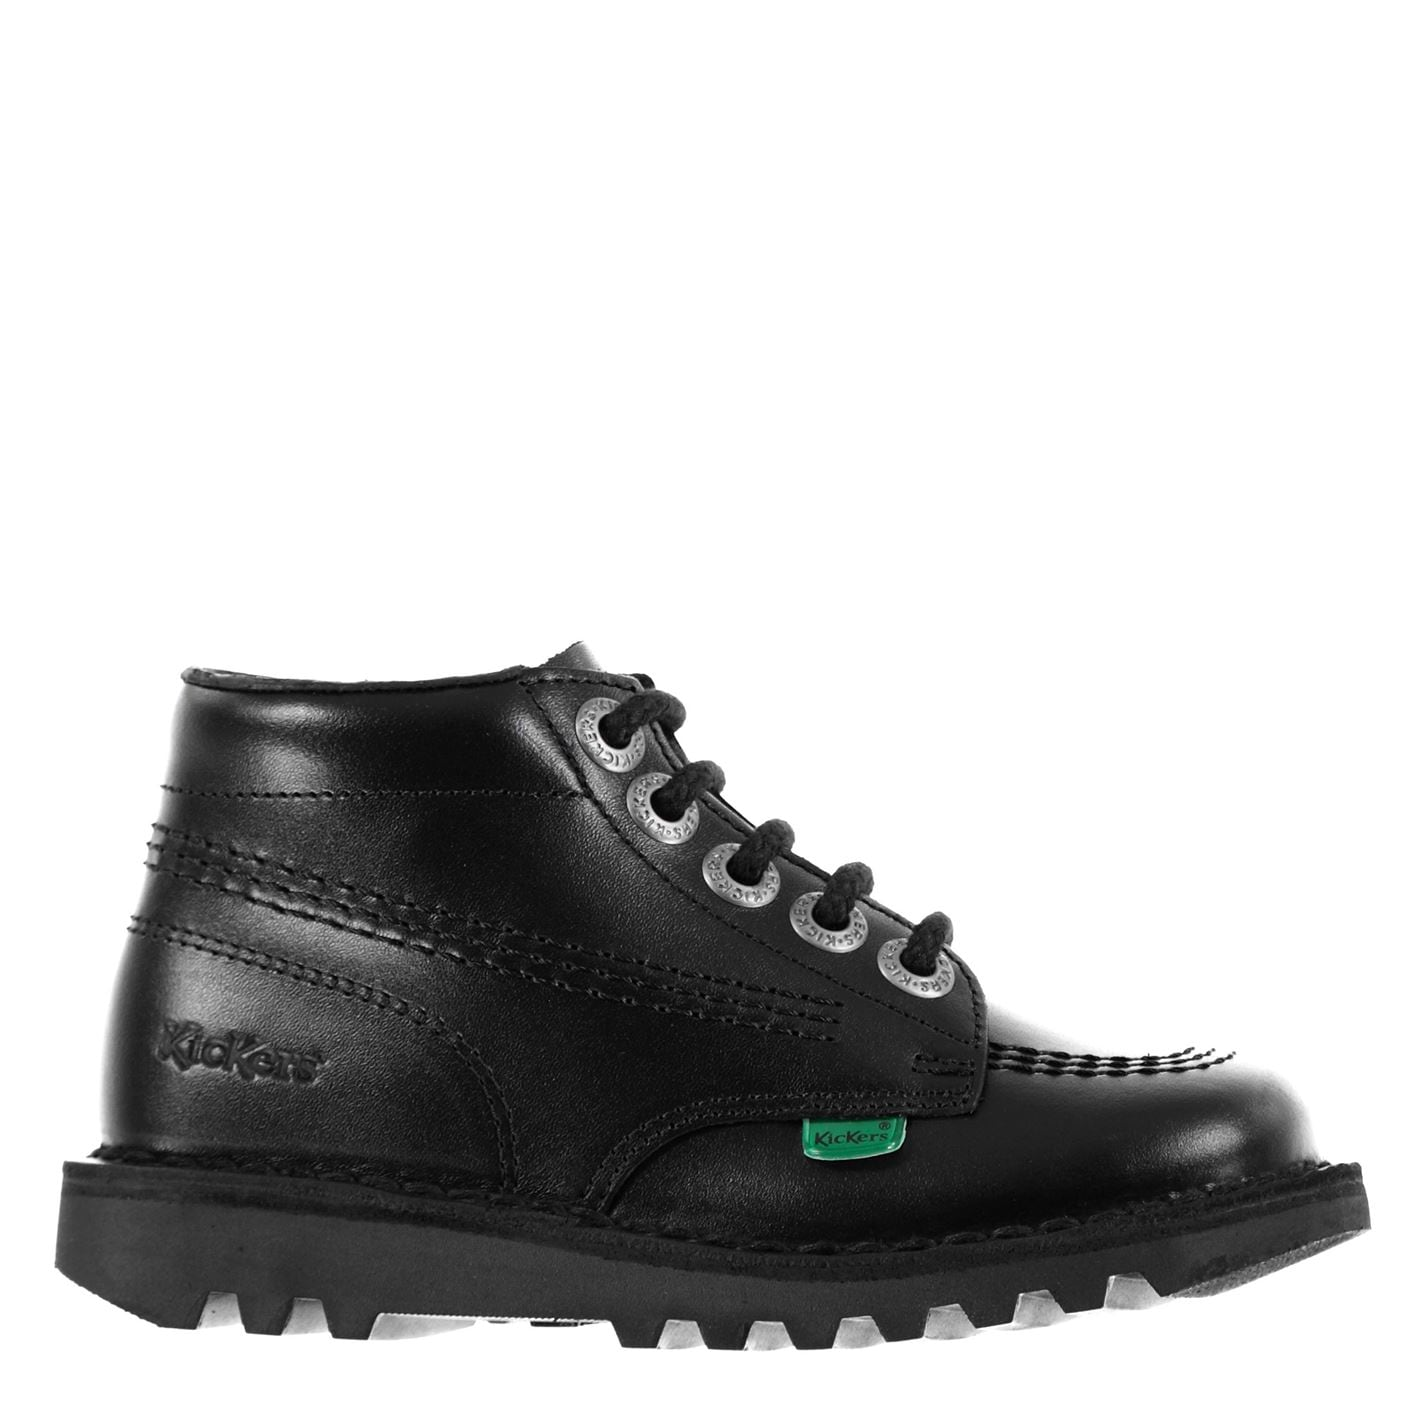 Kickers Kickers Childrens Hi Boots Black leather